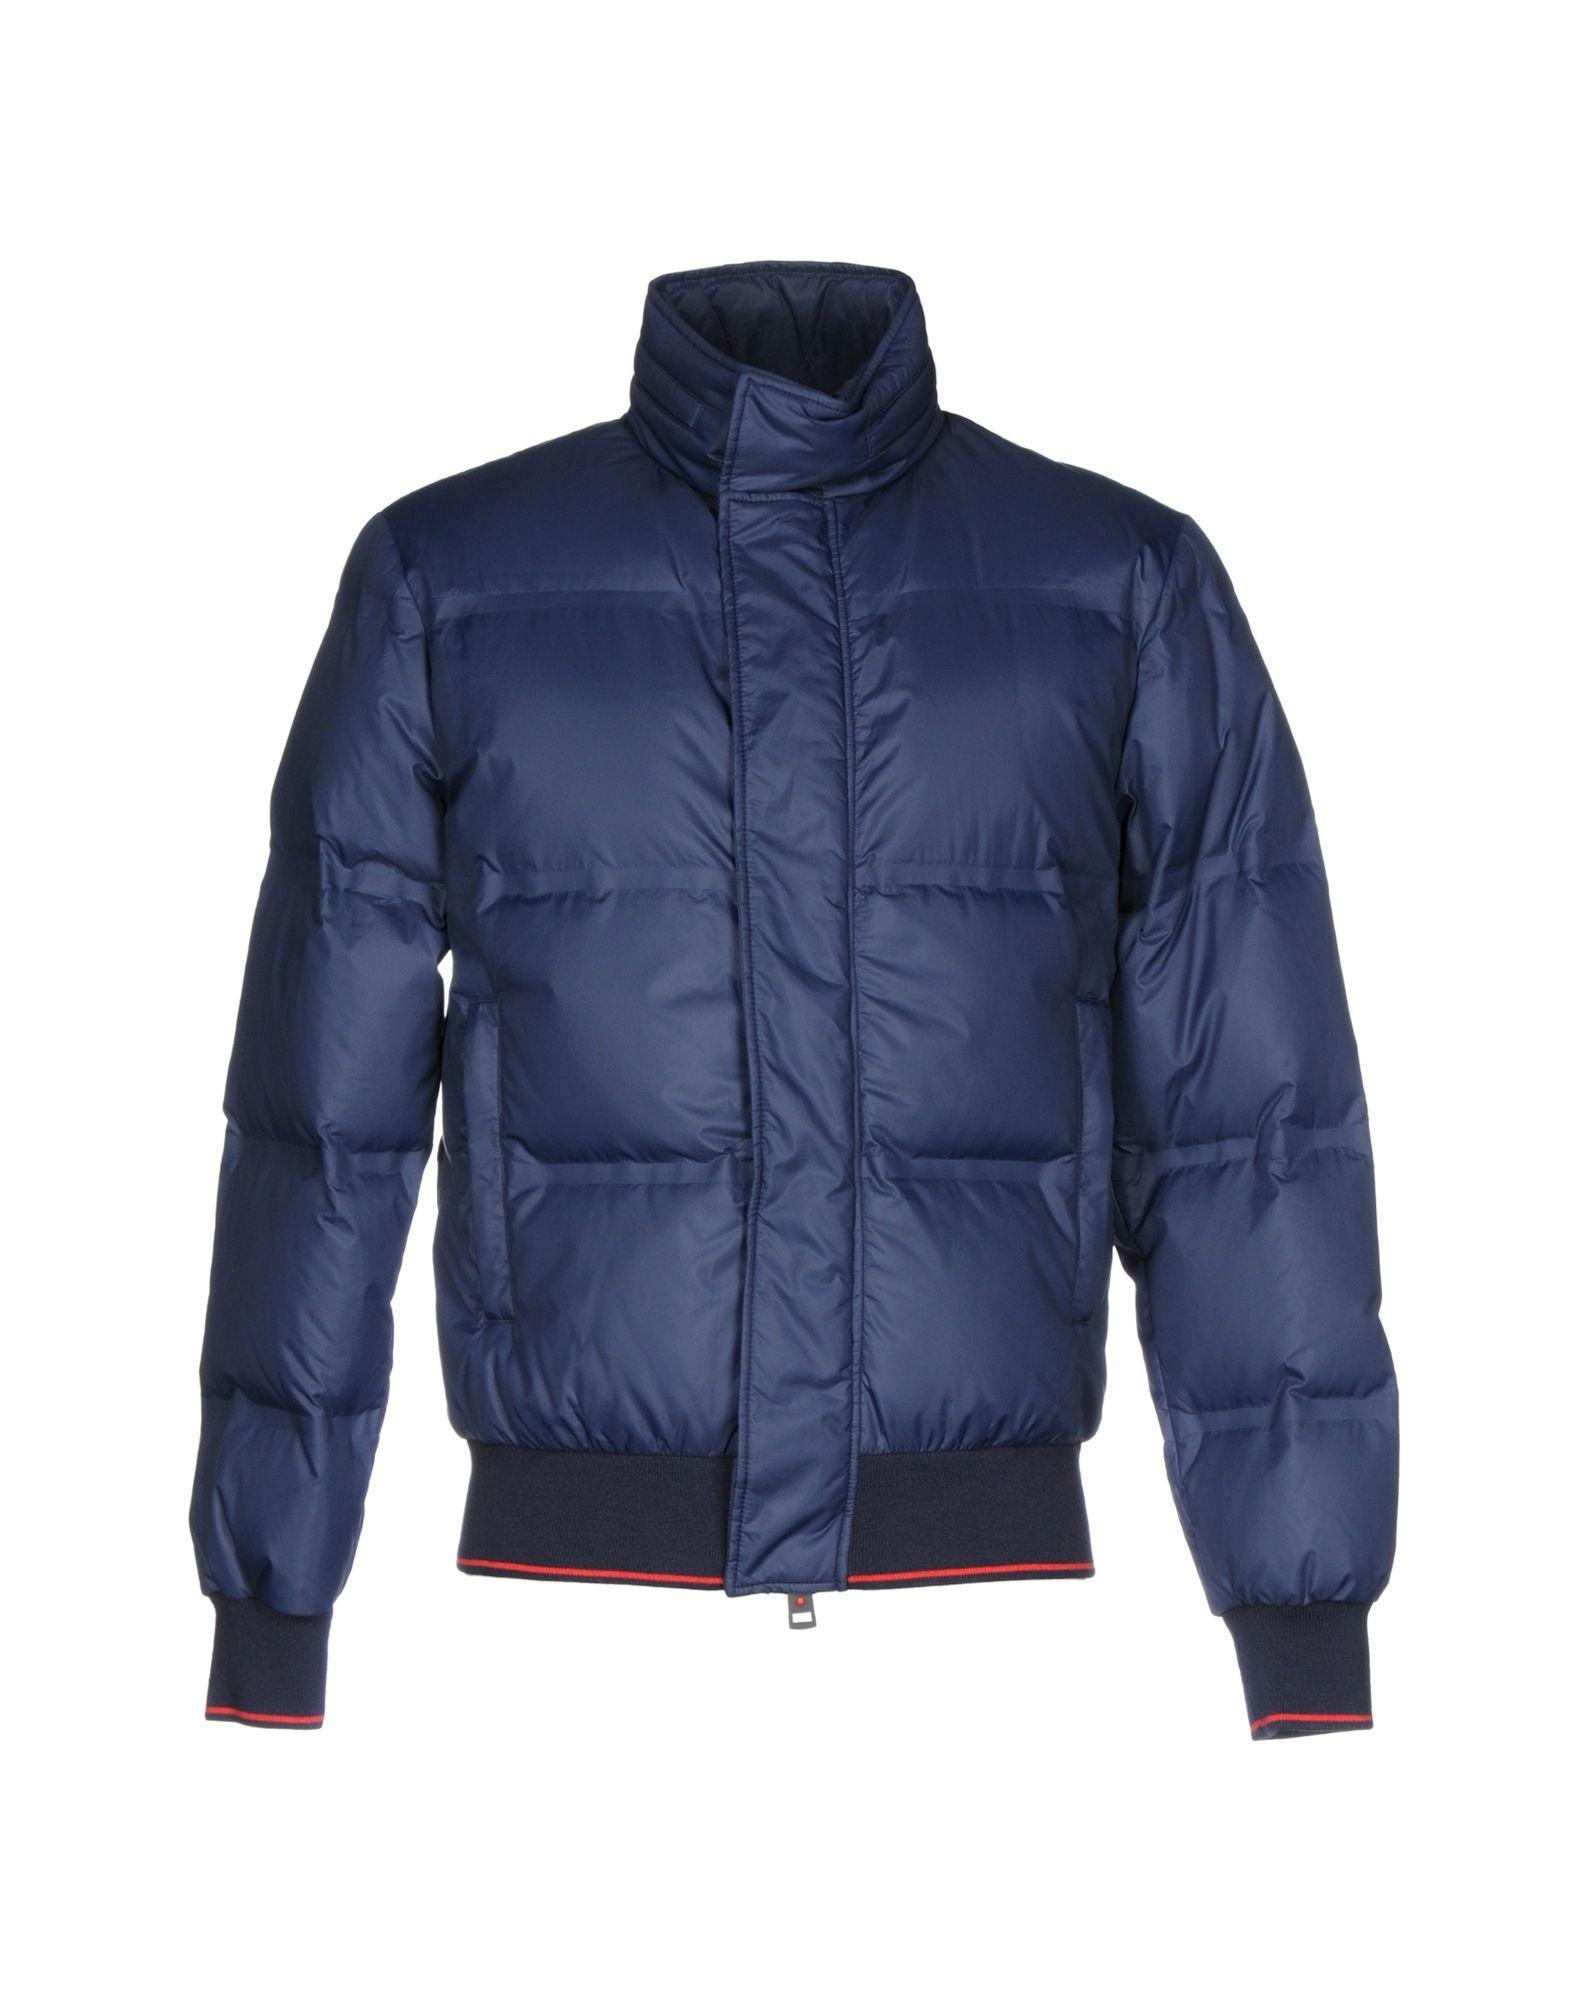 Kired Down Jackets In Dark Blue